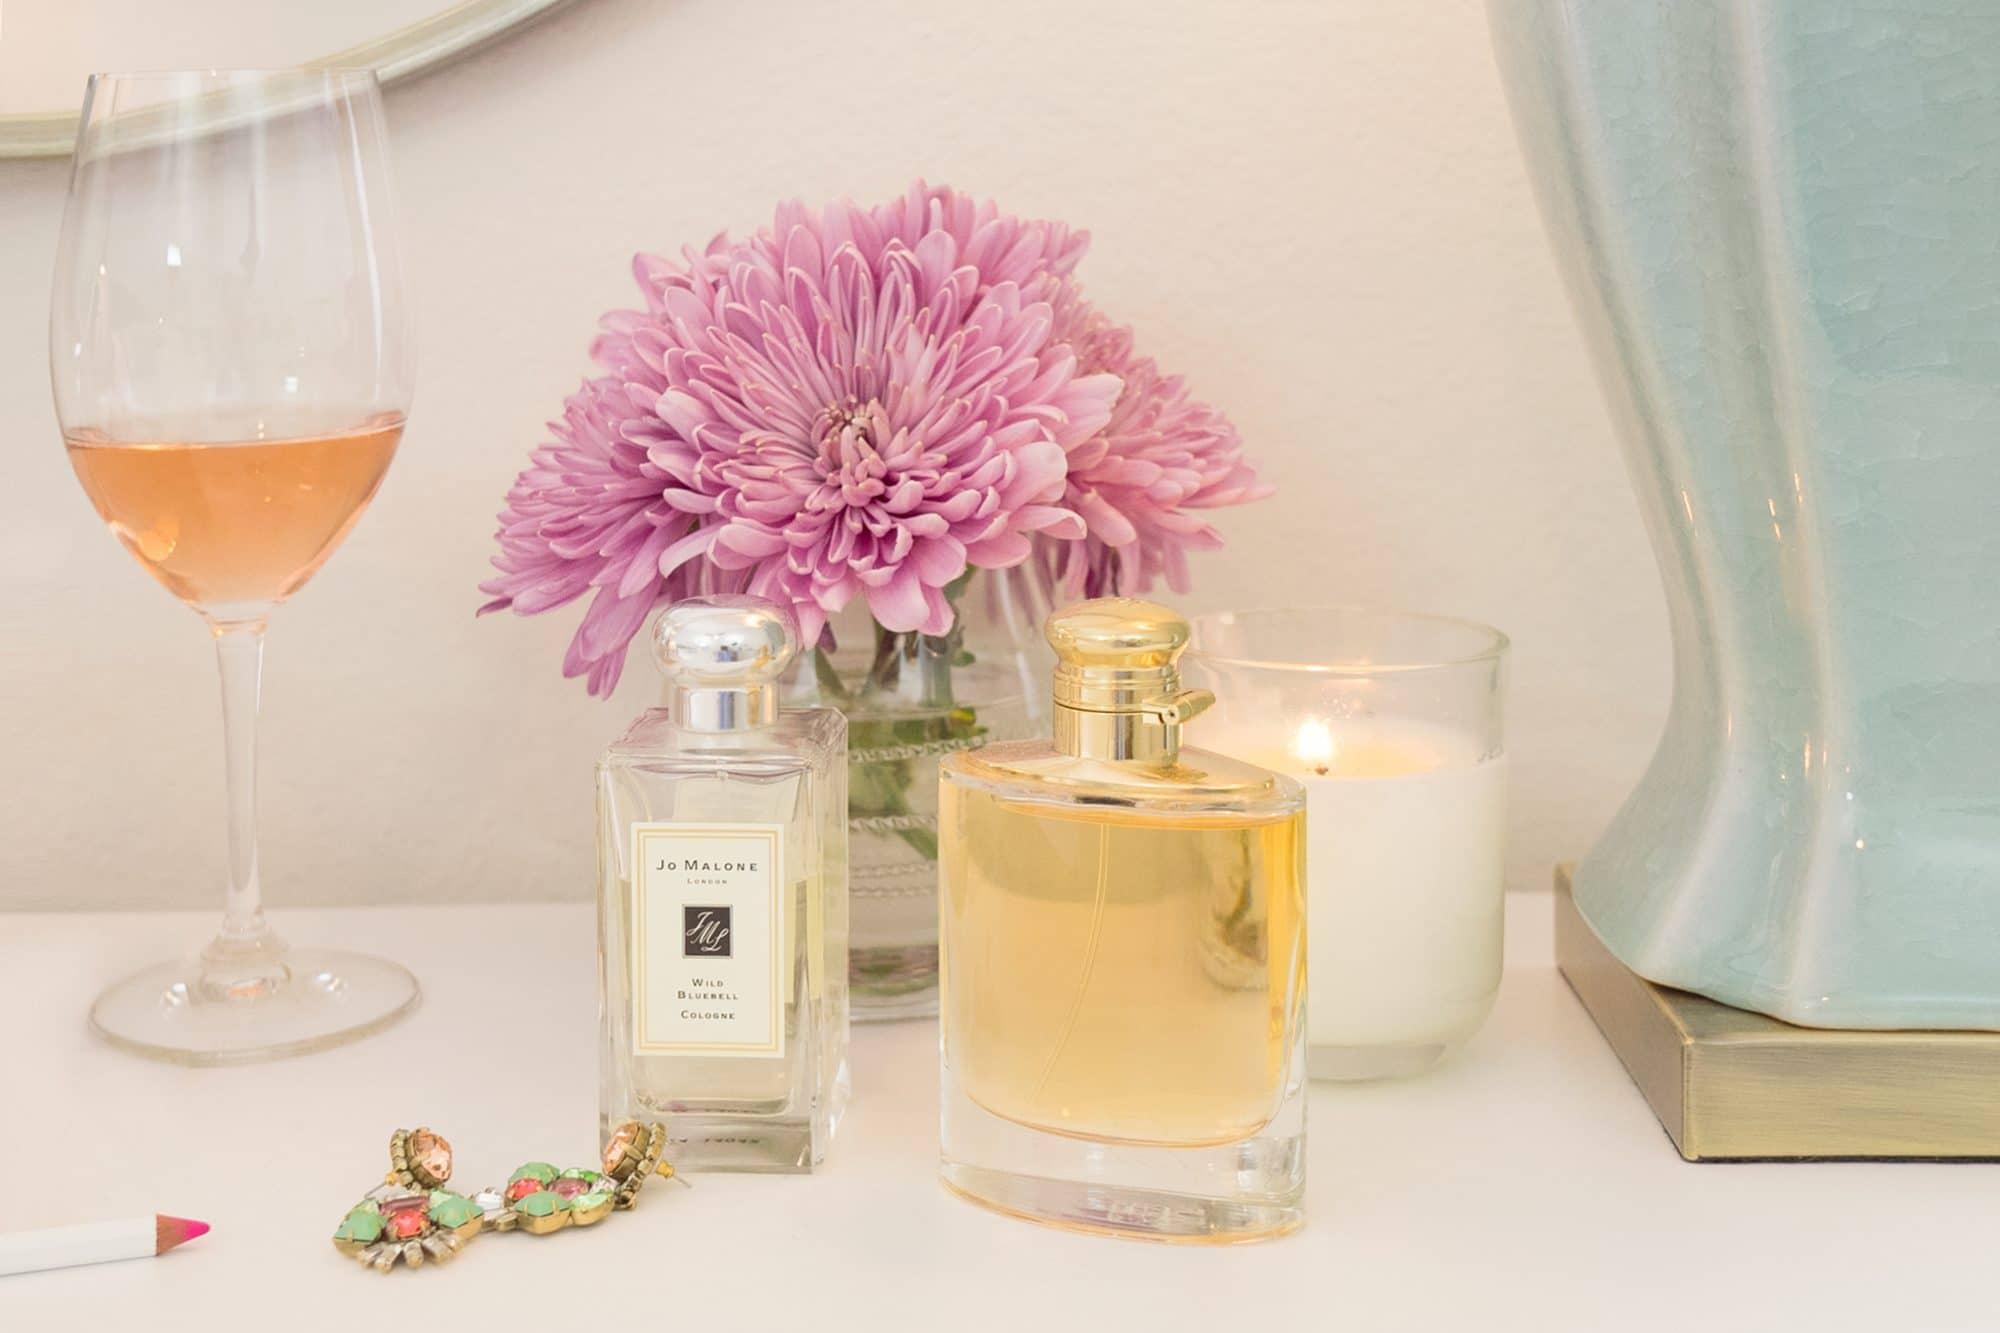 4 Perfumes That Won't Give You a Headache   www.ashleybrookedesigns.com